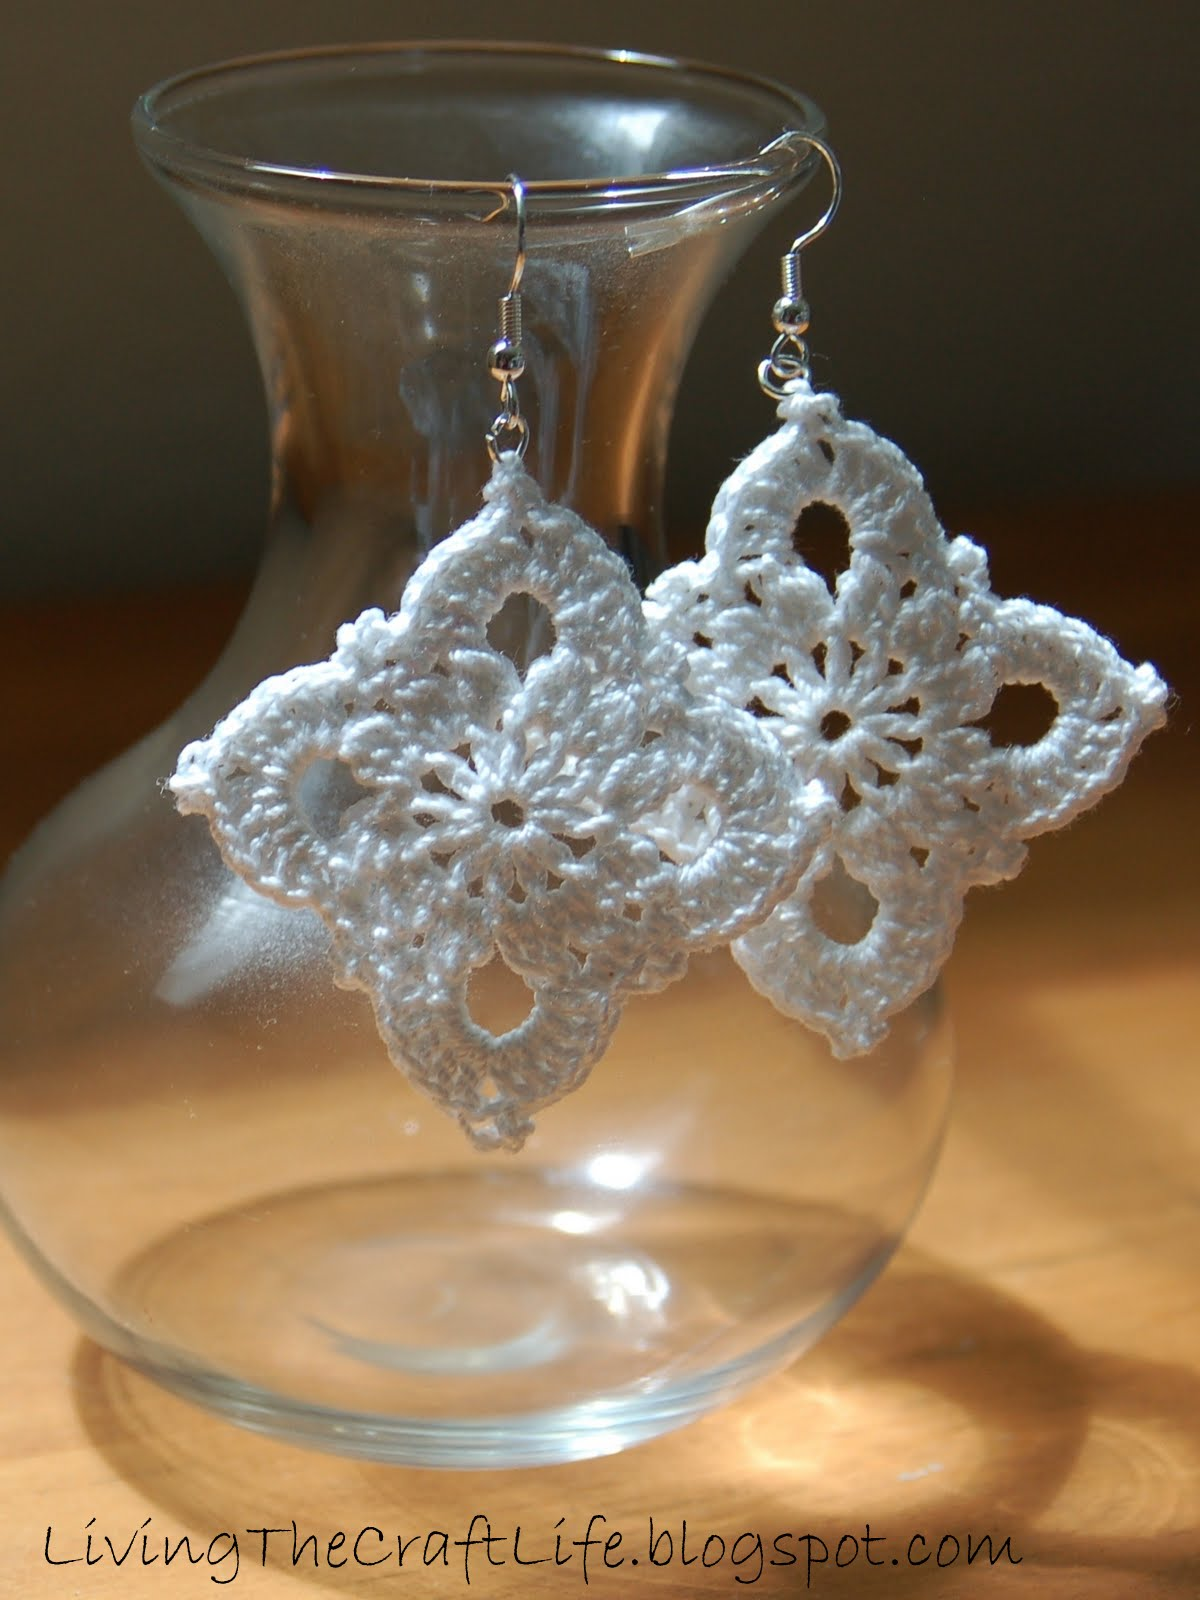 Free Crochet Patterns For Earrings : Living the Craft Life: Large Royal Earrings - Free Crochet ...